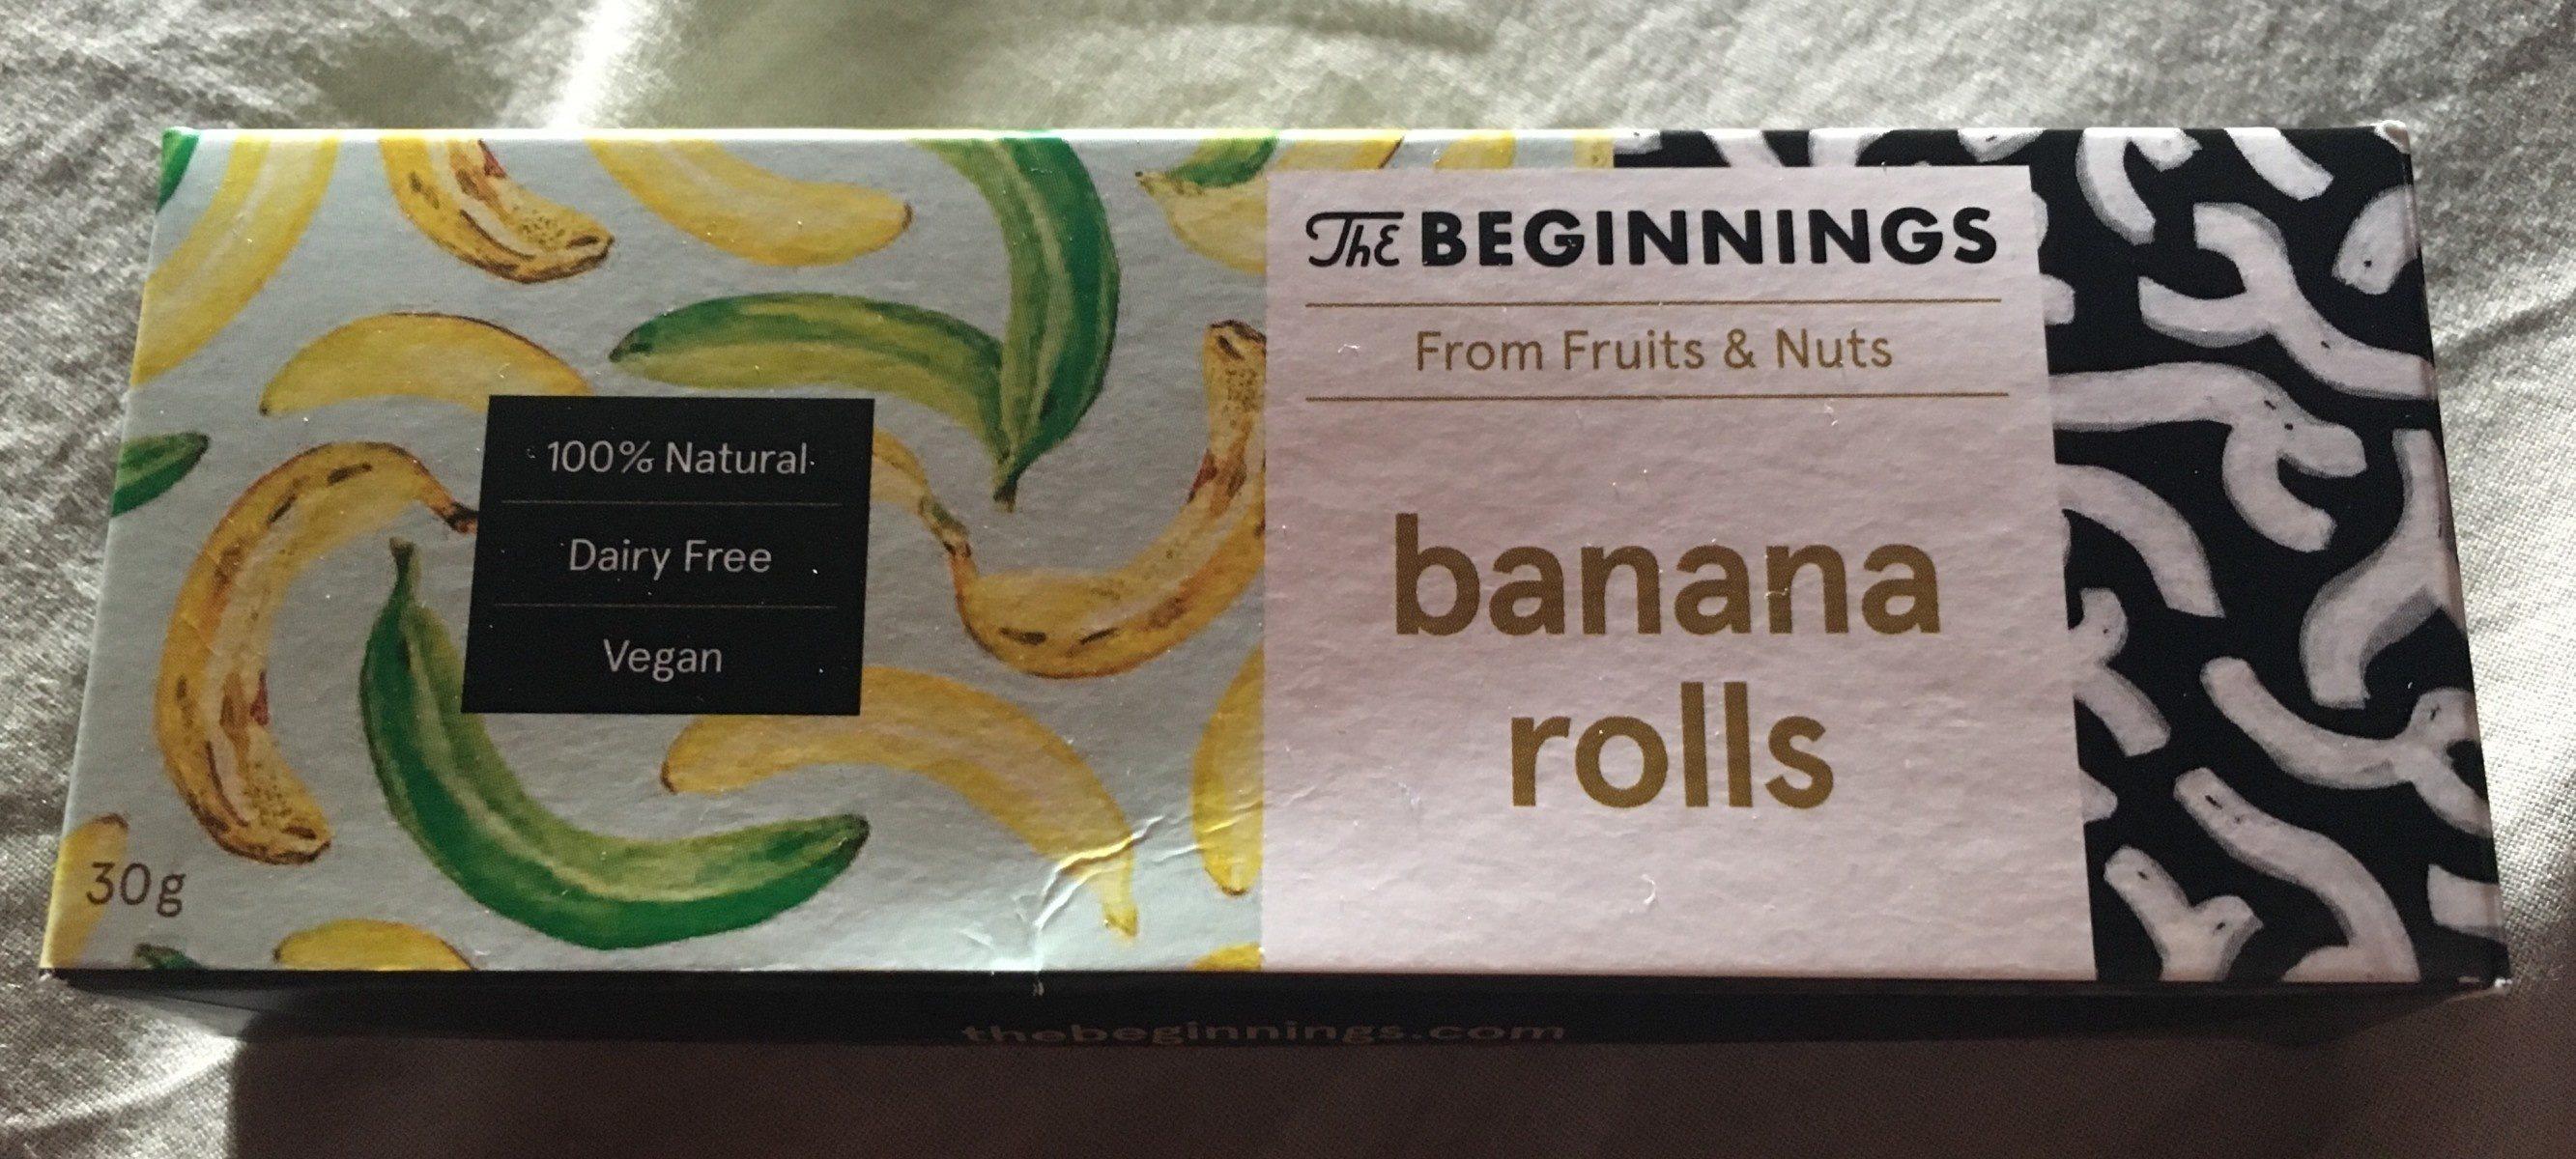 Banana Rolls - Product